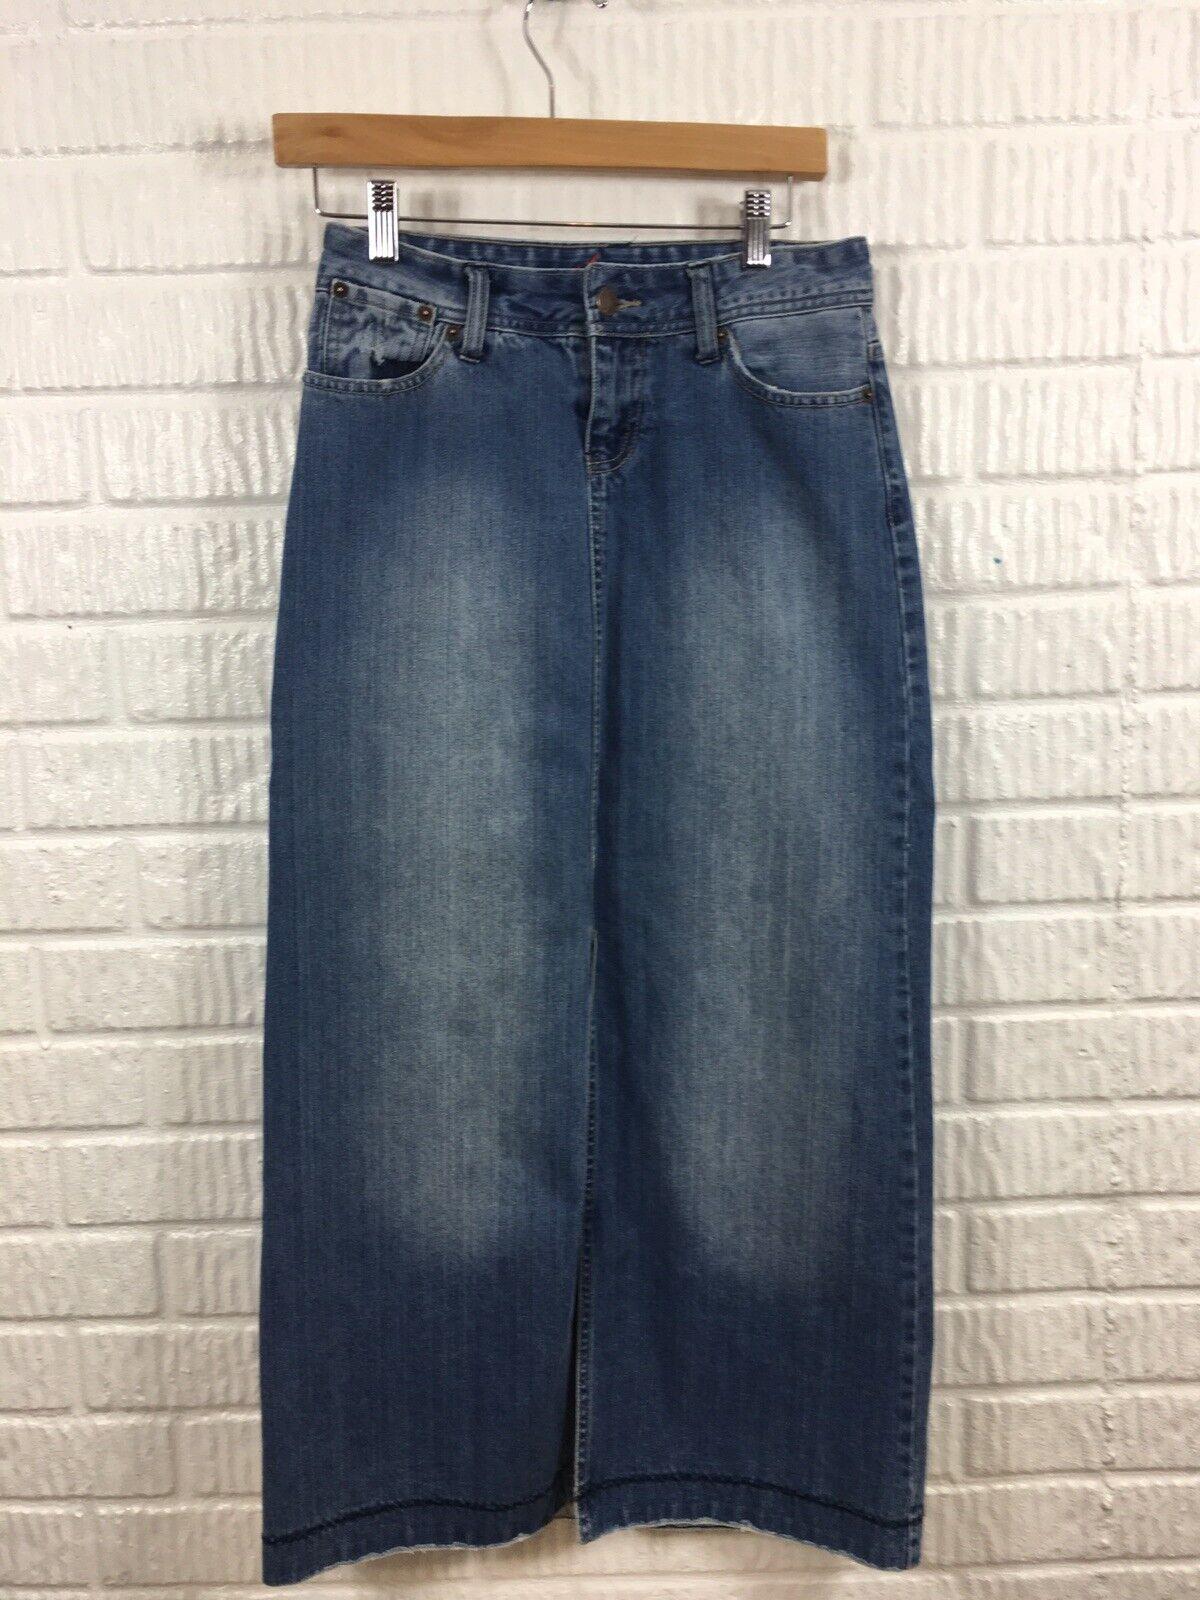 Maurices Long Denim Jean Skirt Size 3 4 EUC Modest Rare Front Slit